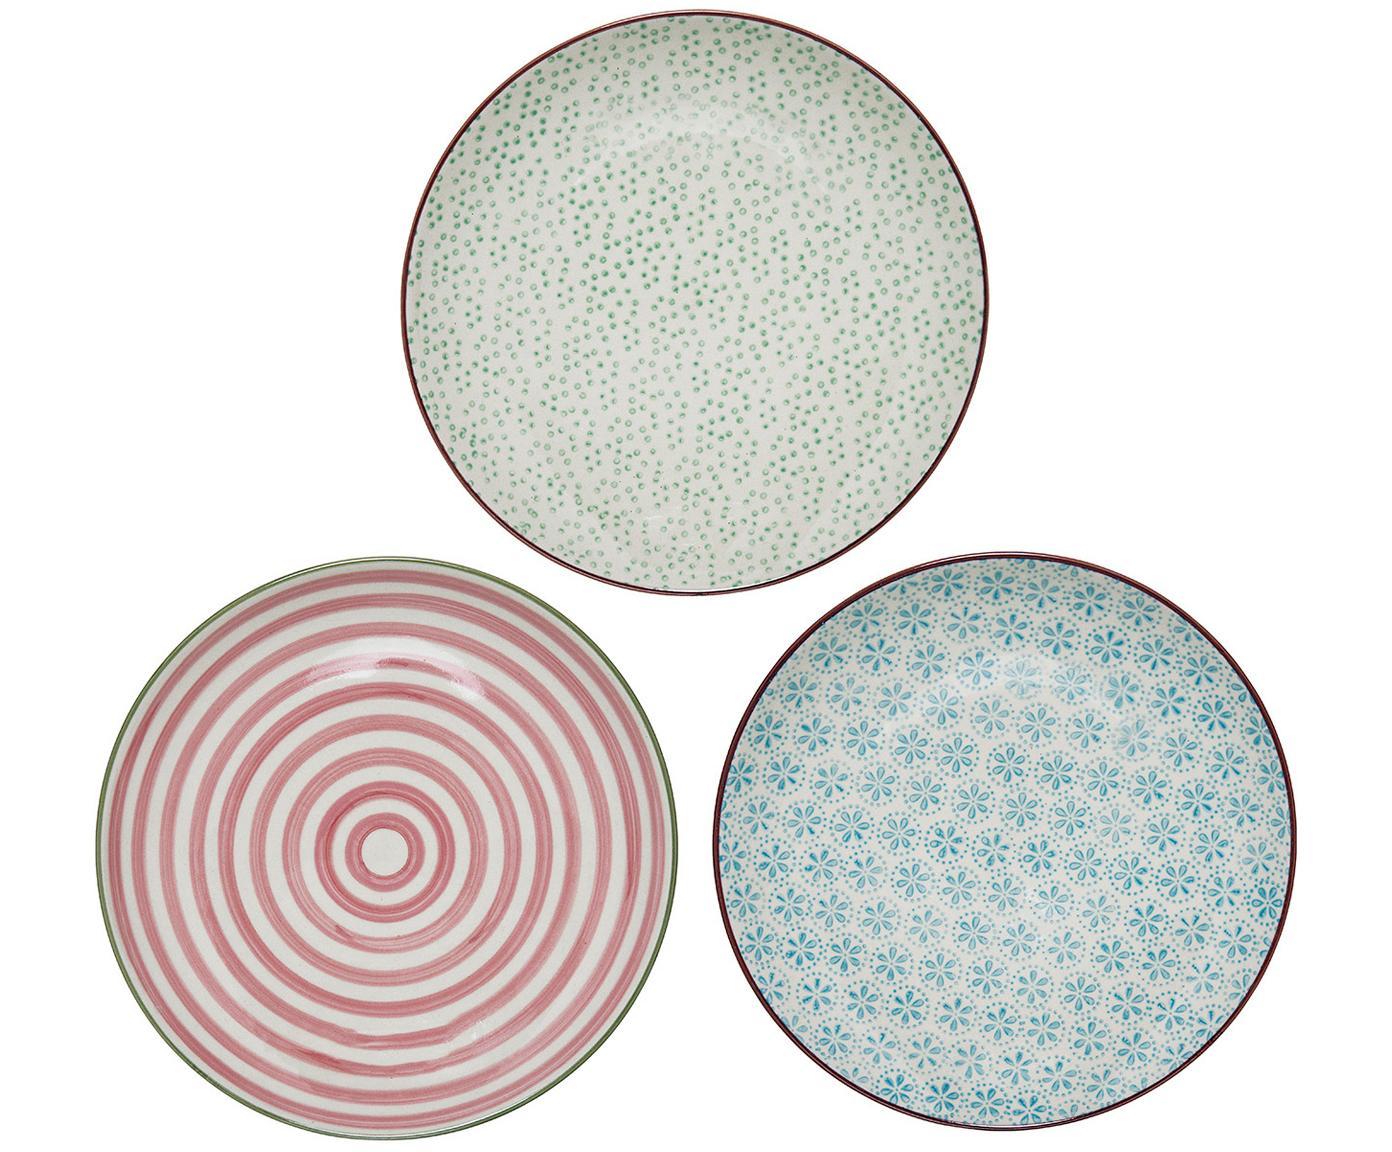 Frühstücksteller-Set Patrizia, 3-tlg., Steingut, Weiss, Grün, Rot, Blau, Ø 20 cm